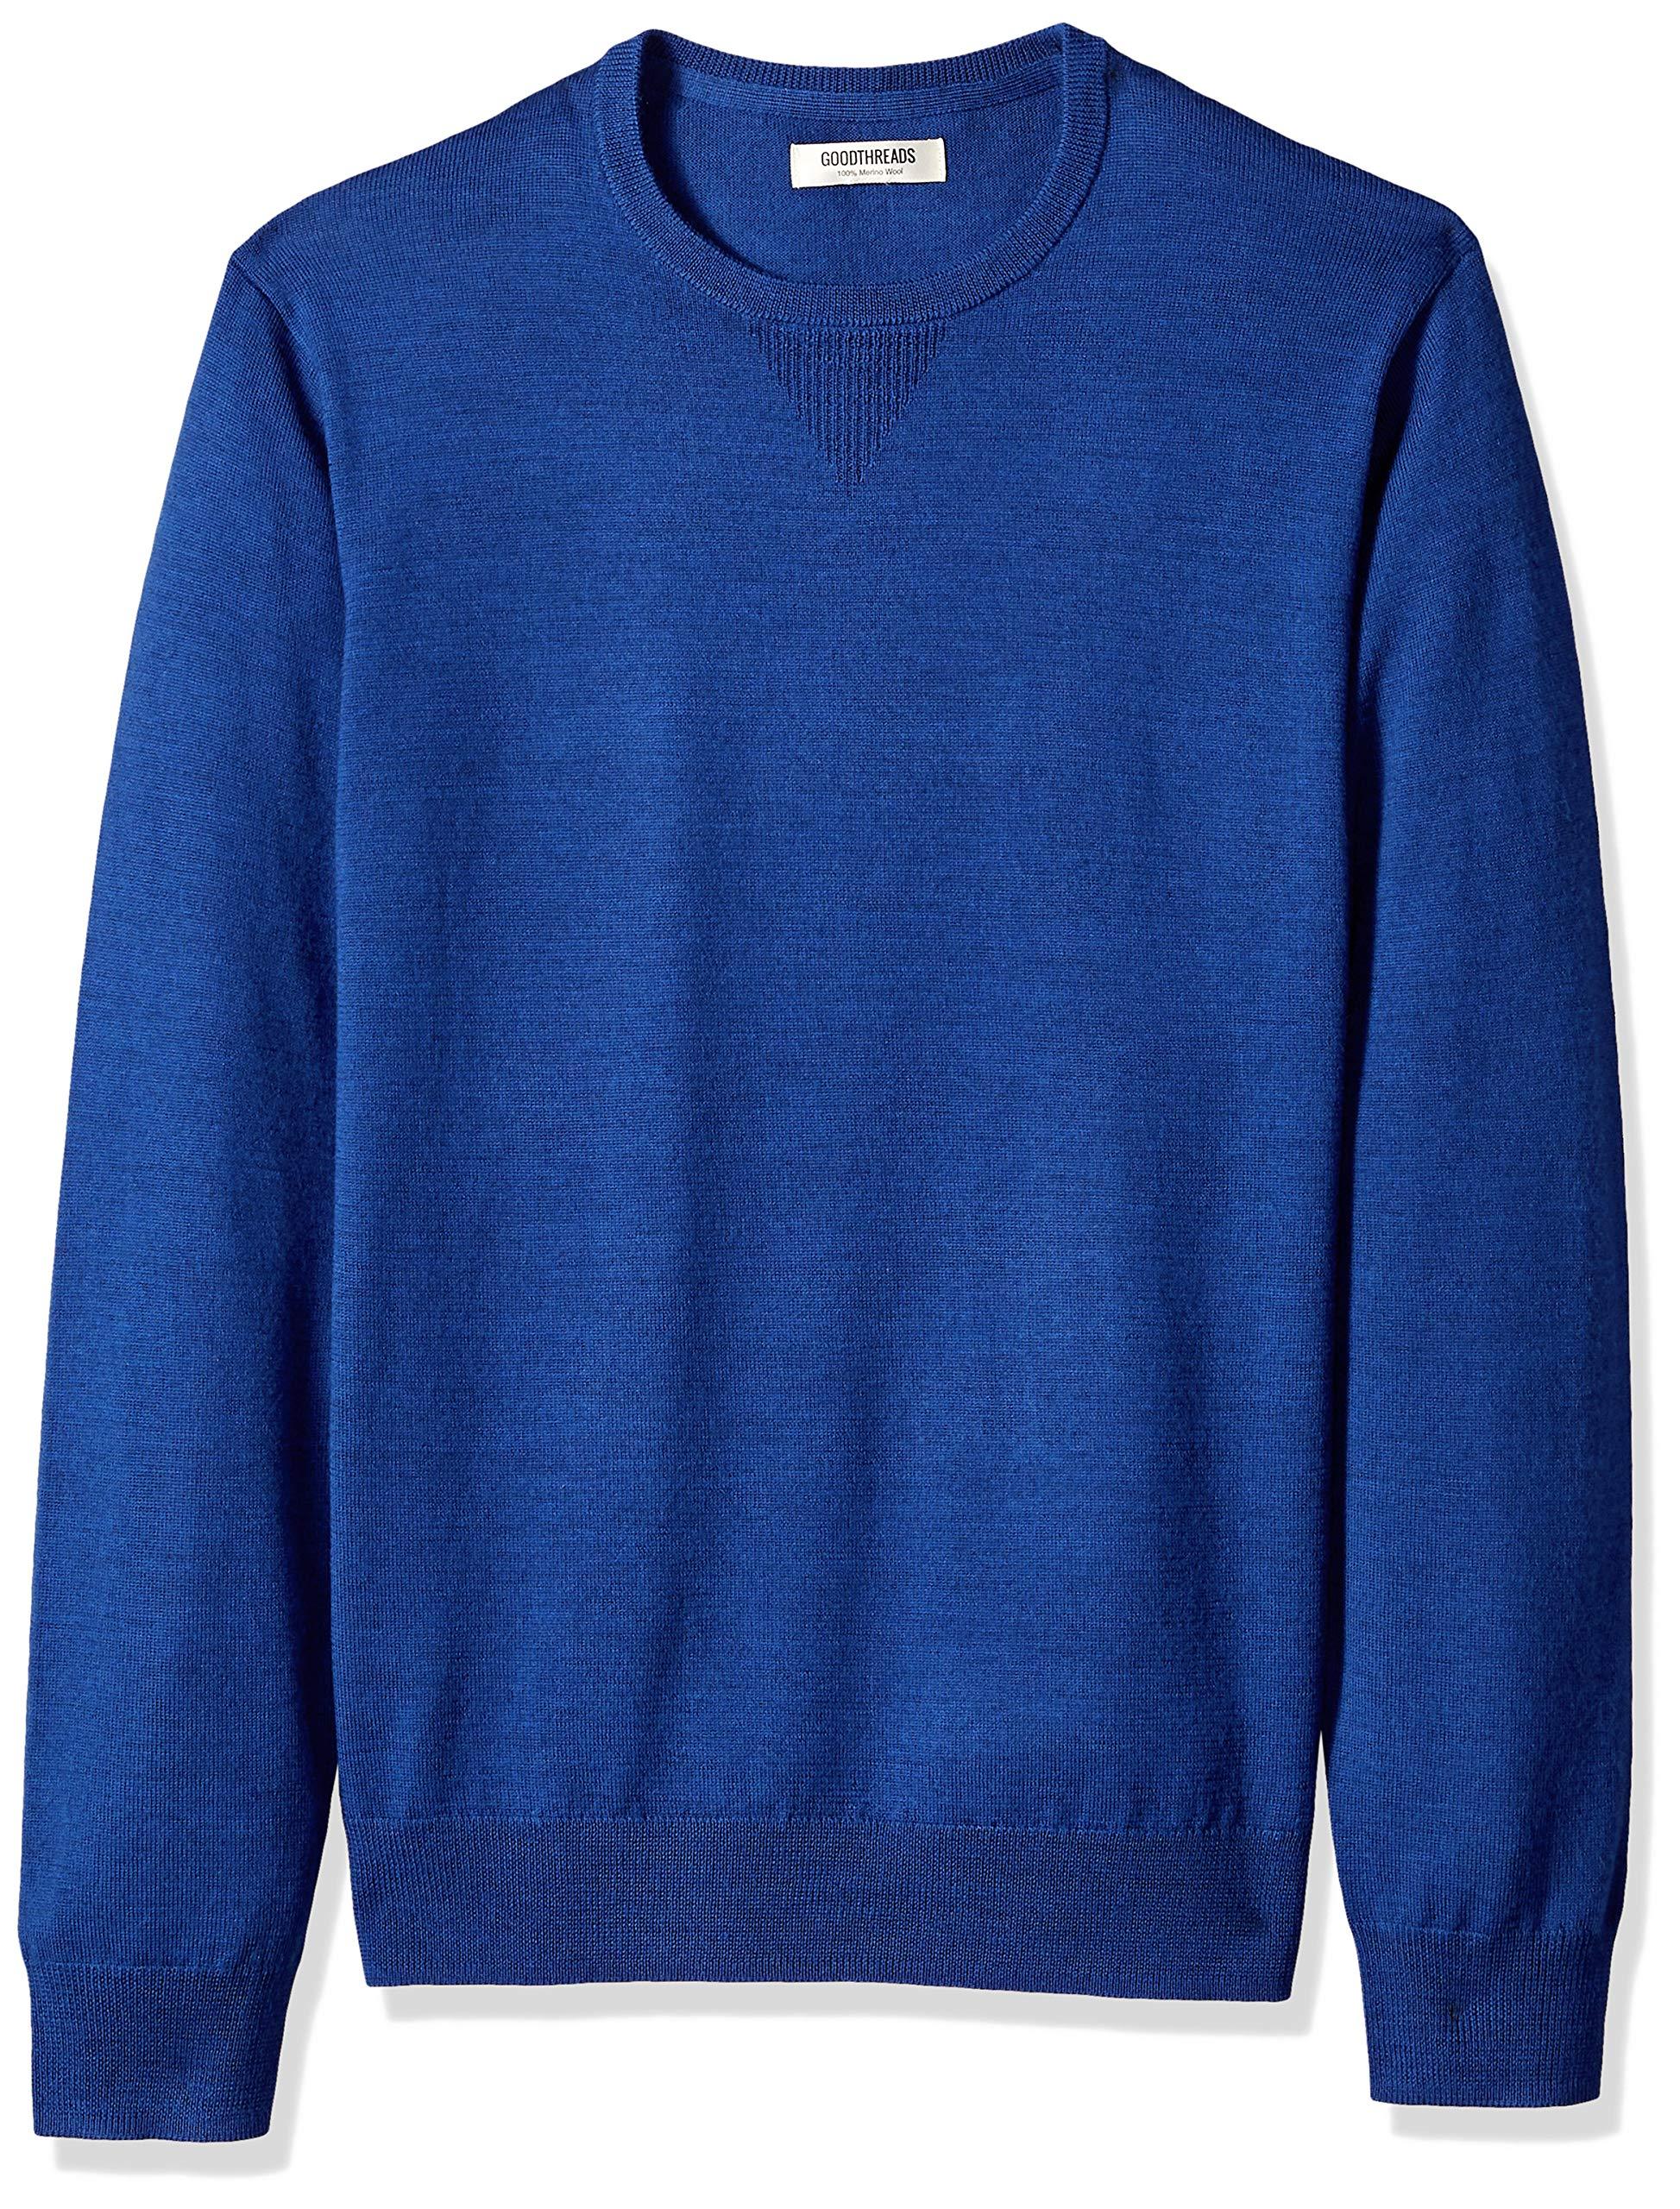 Goodthreads Men's Merino Wool Crewneck Sweater, Bright Blue, Large